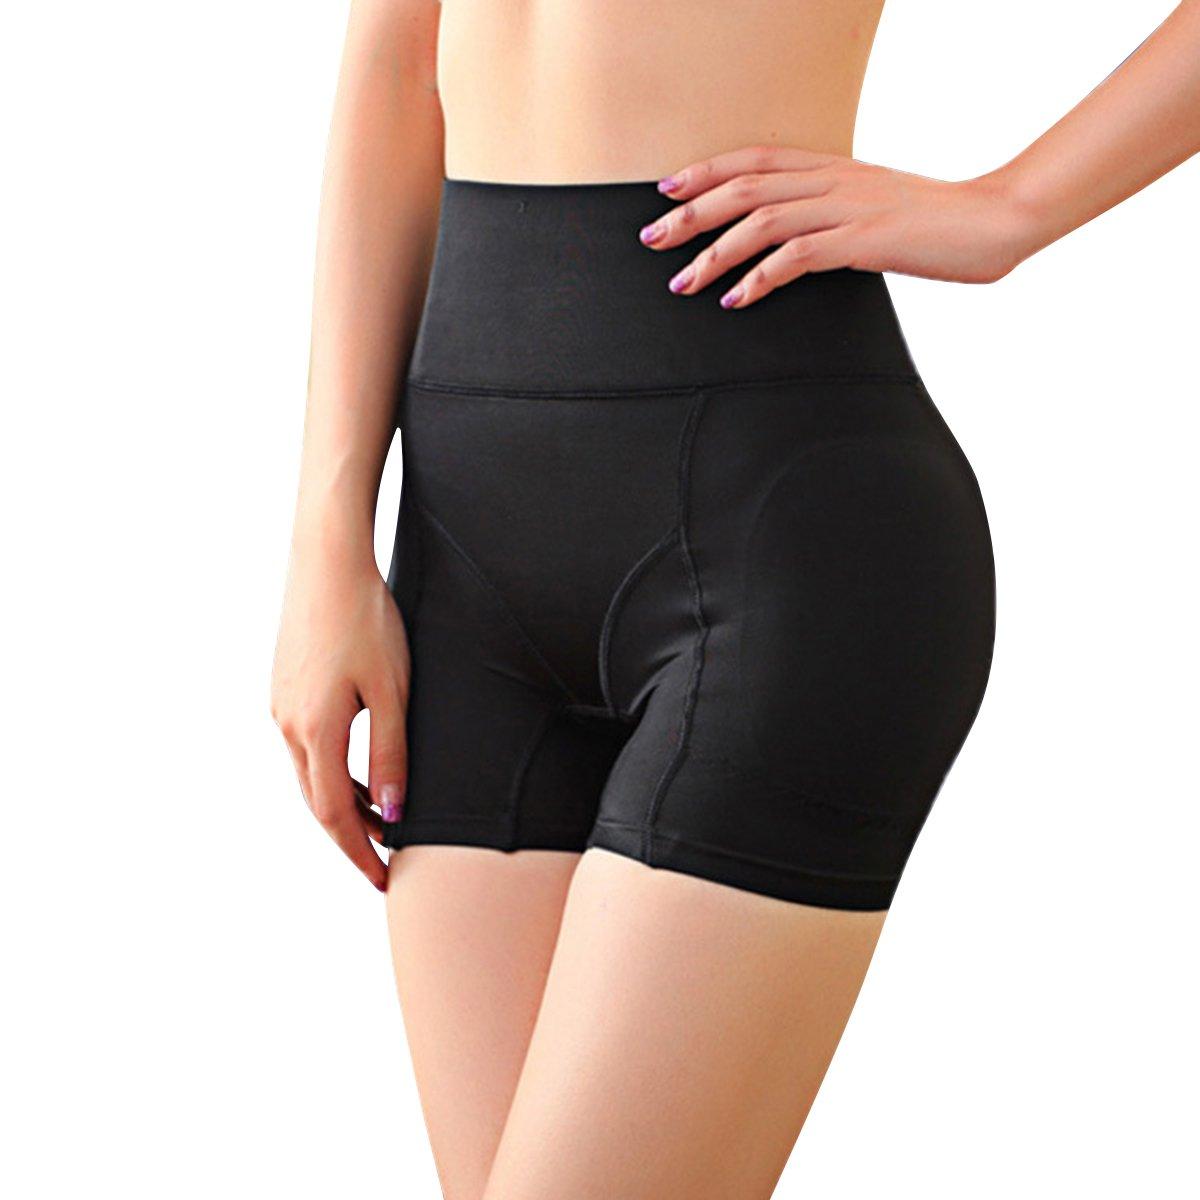 Shymay Women's Hip Enhancer Butt Lifter Padded Panty Waist Girdle Control Panties